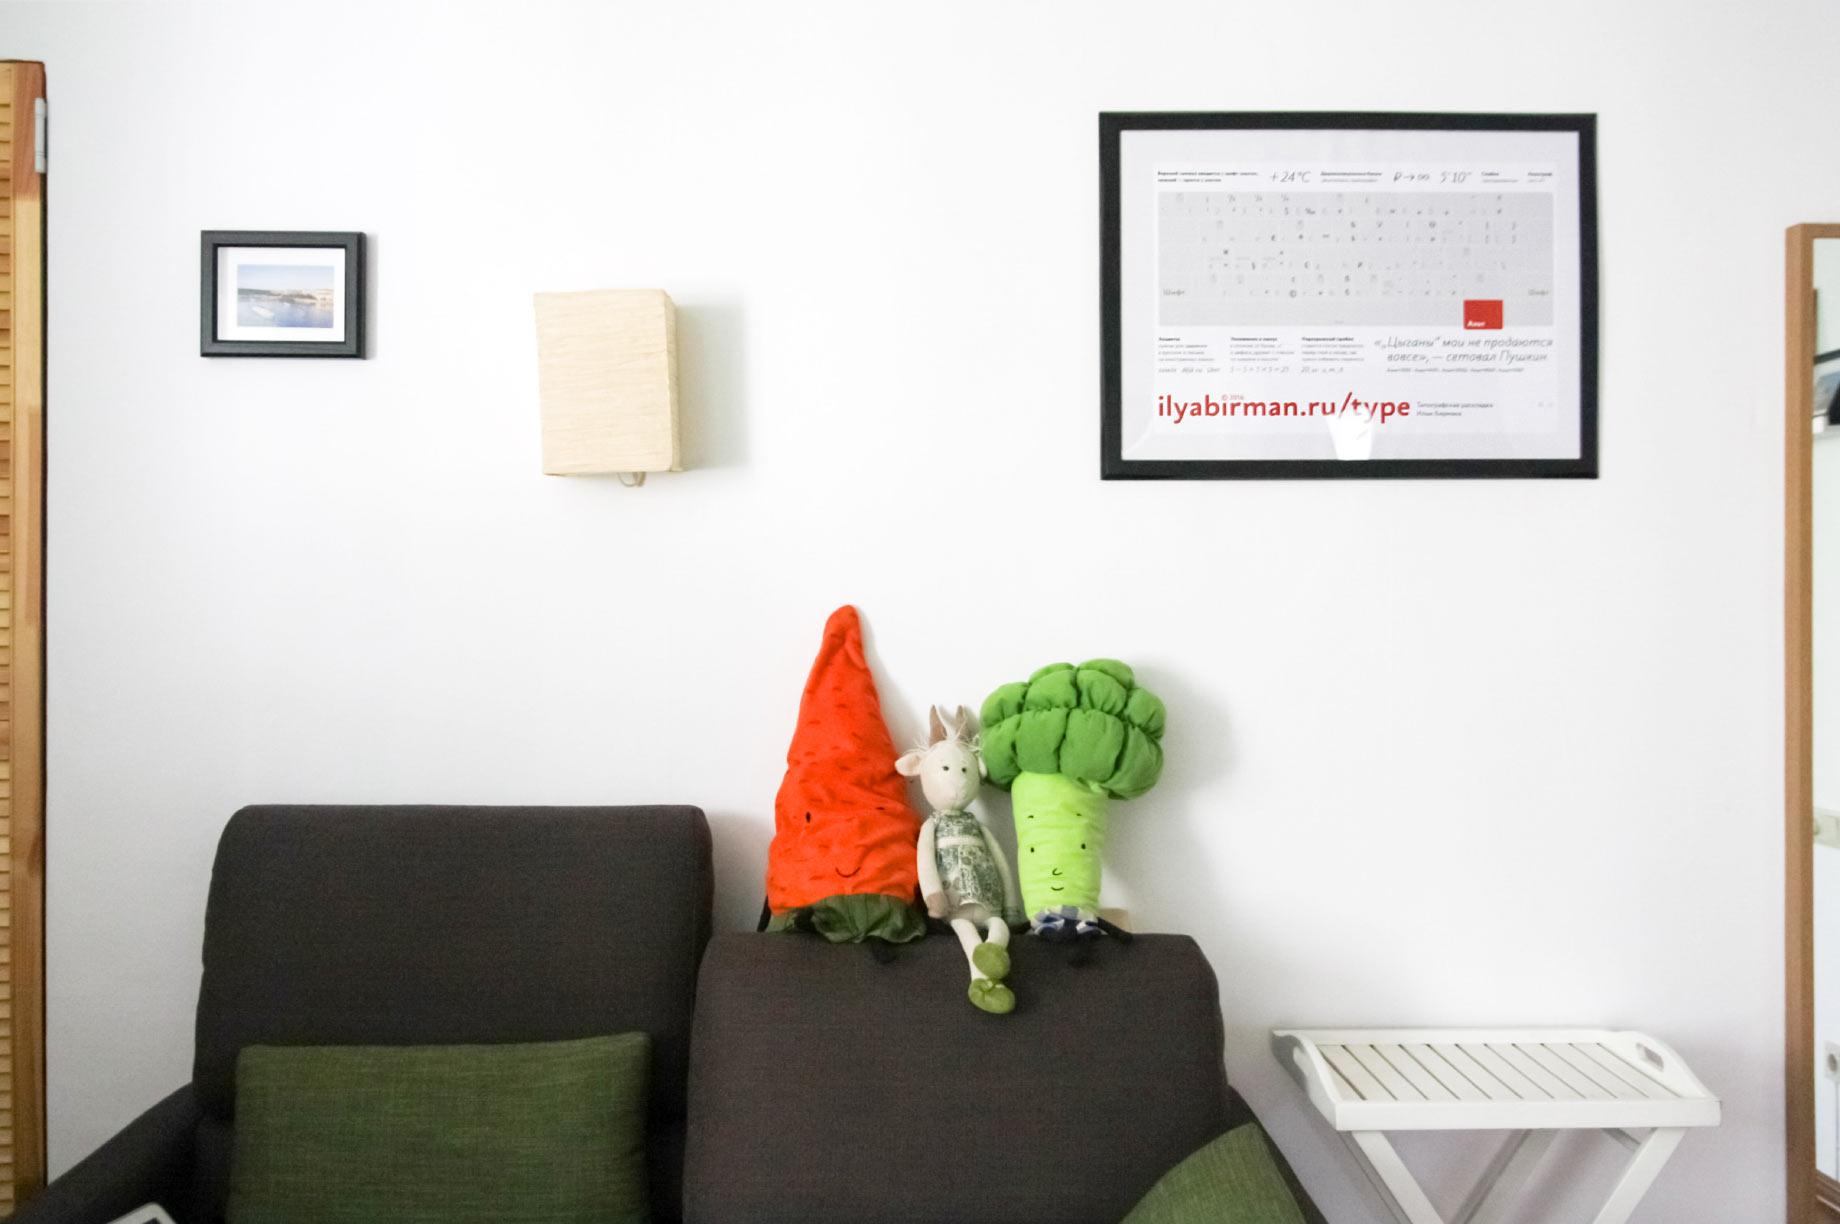 Плакат Типографской раскладки на стене